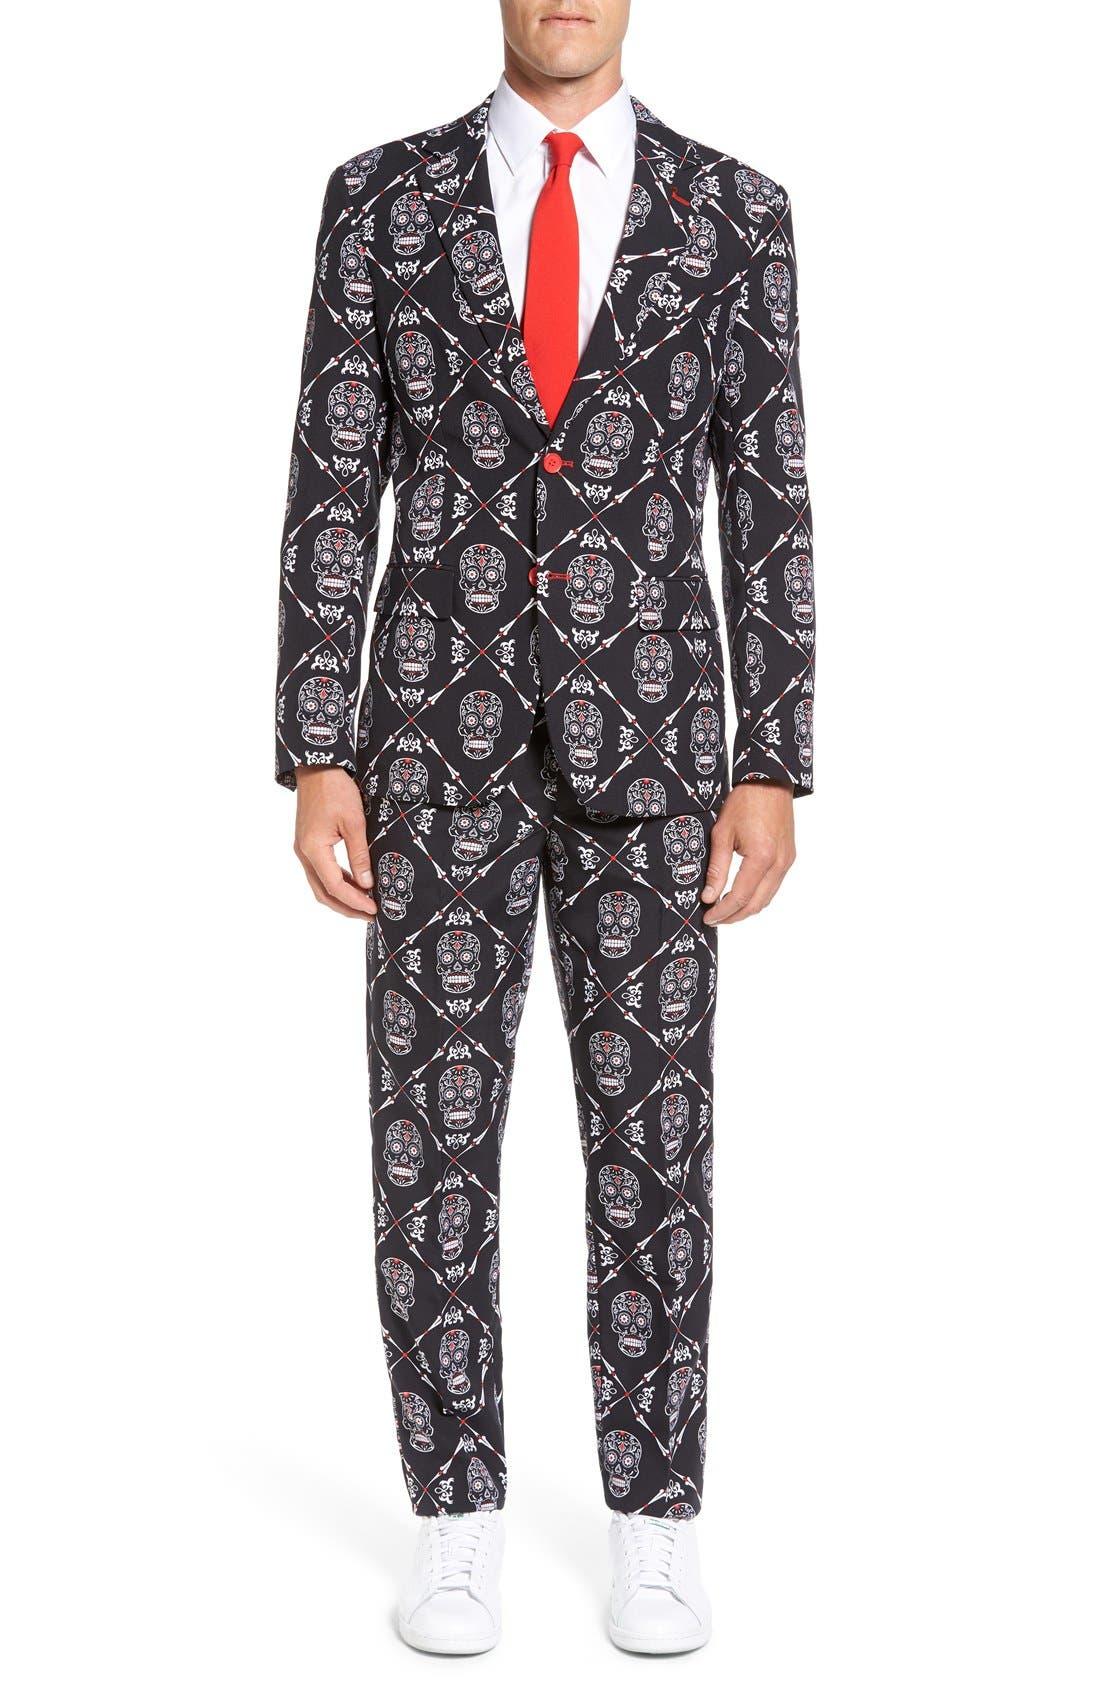 'Haunting Hombre' Trim Fit Suit with Tie,                             Main thumbnail 1, color,                             001